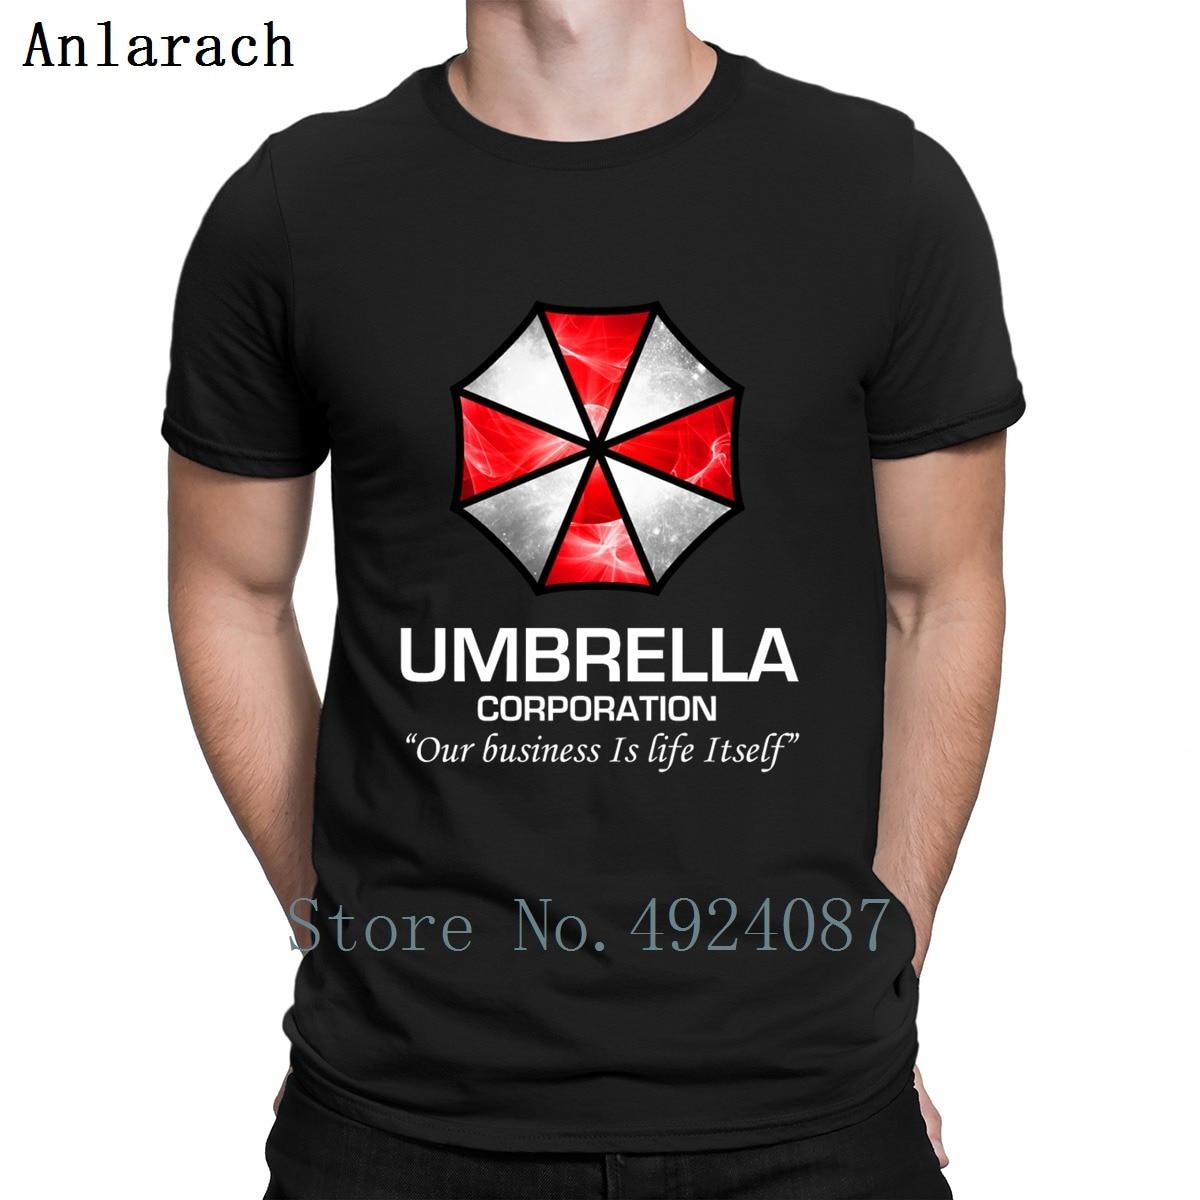 Umbrella Corporation Organic T Shirt Crazy Letter Creative Mens Tee Shirts Men Fashions Summer Style Fitness Clothing